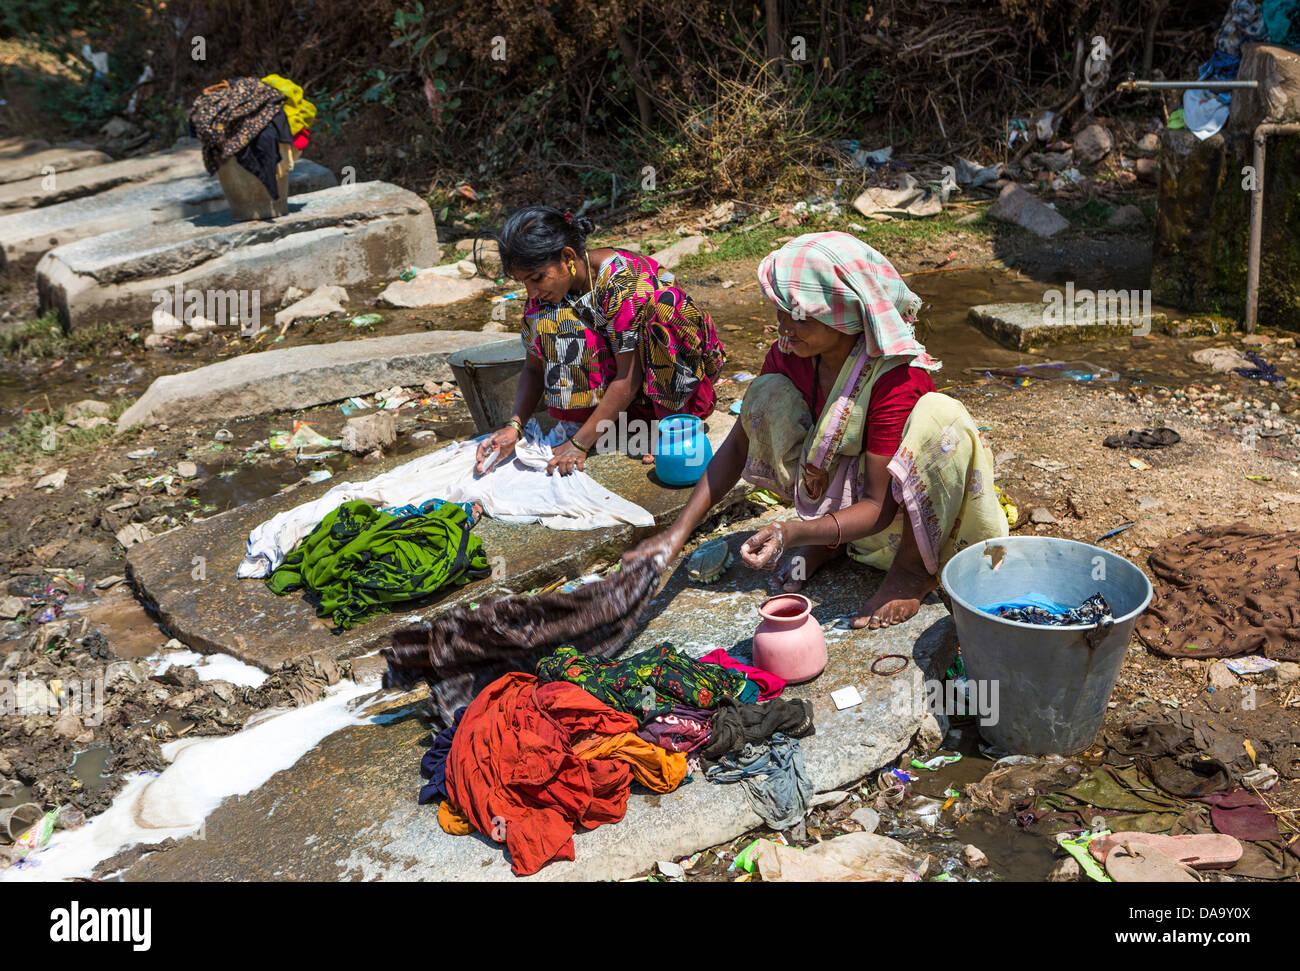 India, South India, Asia, primitive, colourful, hard, washing, women, working - Stock Image